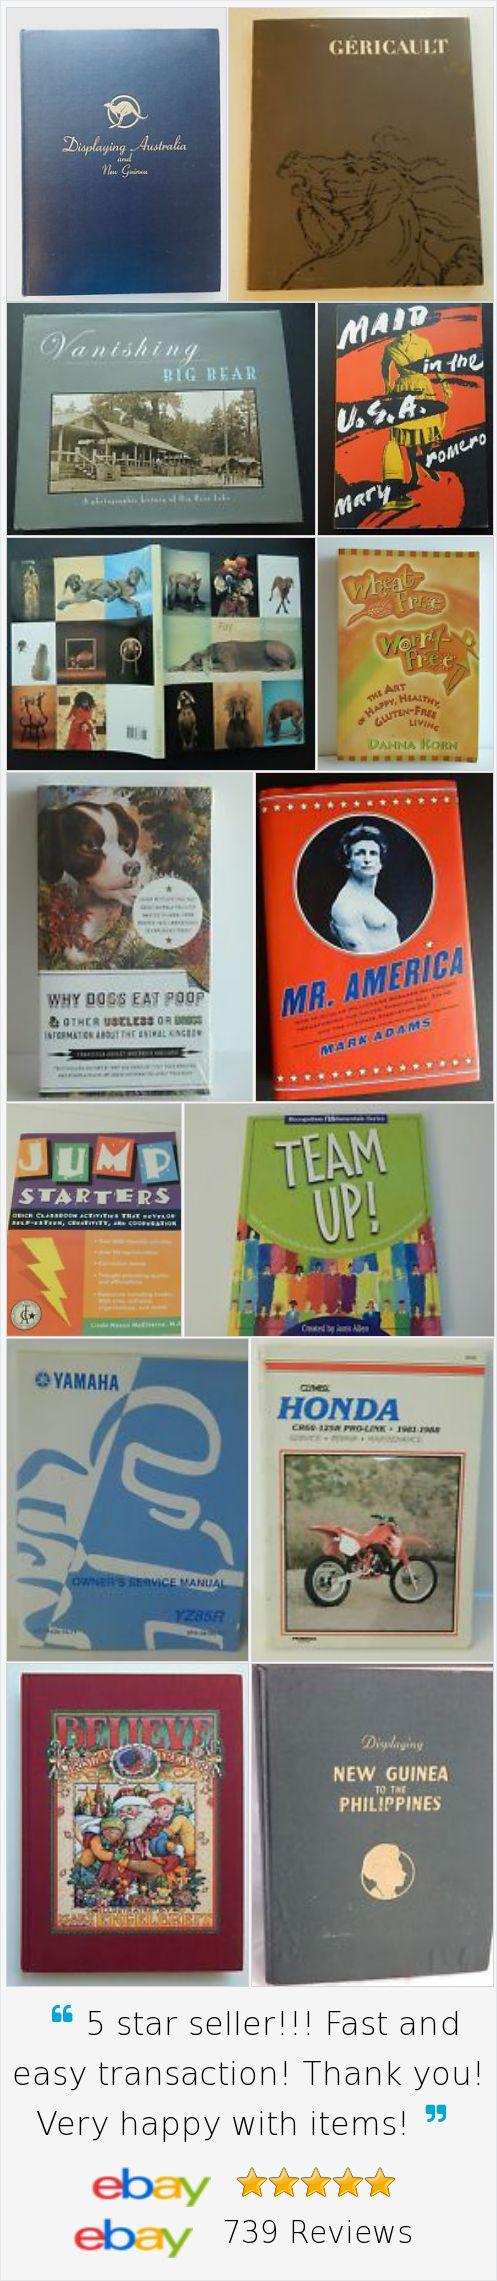 Non Fiction Books in LargoWares store on eBay!